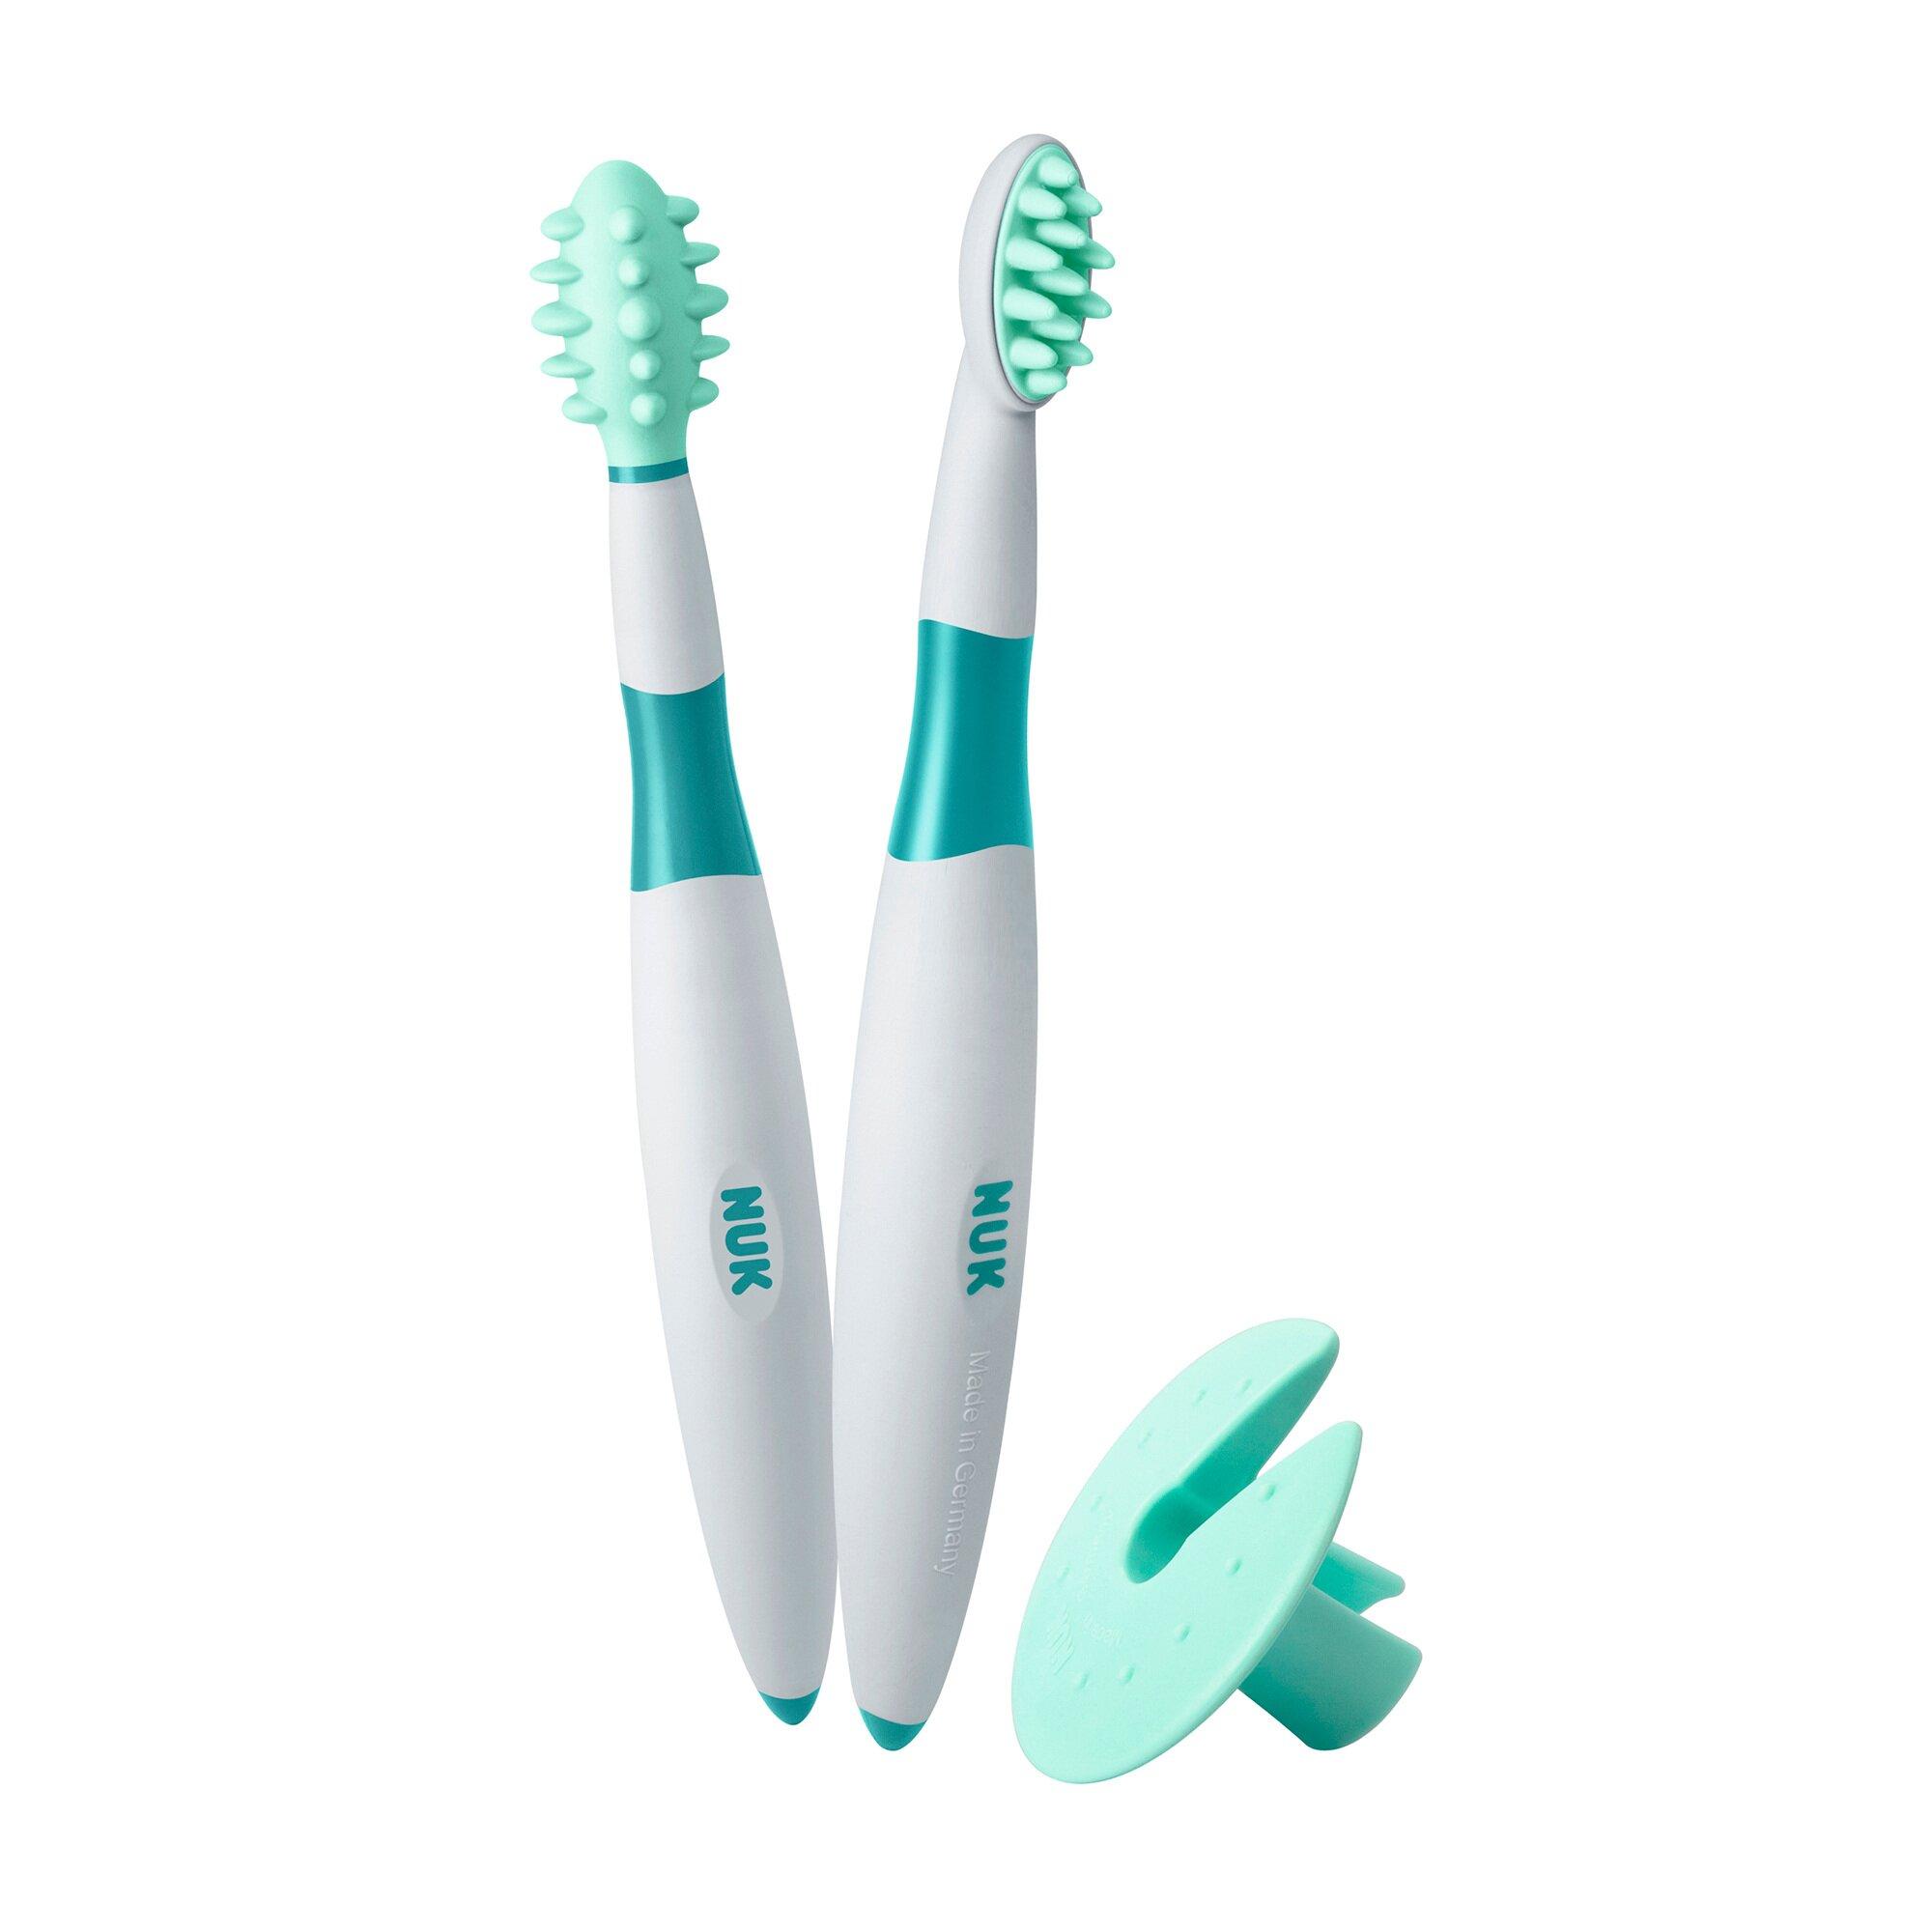 Zahnpflege Lernset mit Schutzkappe 3-tlg.